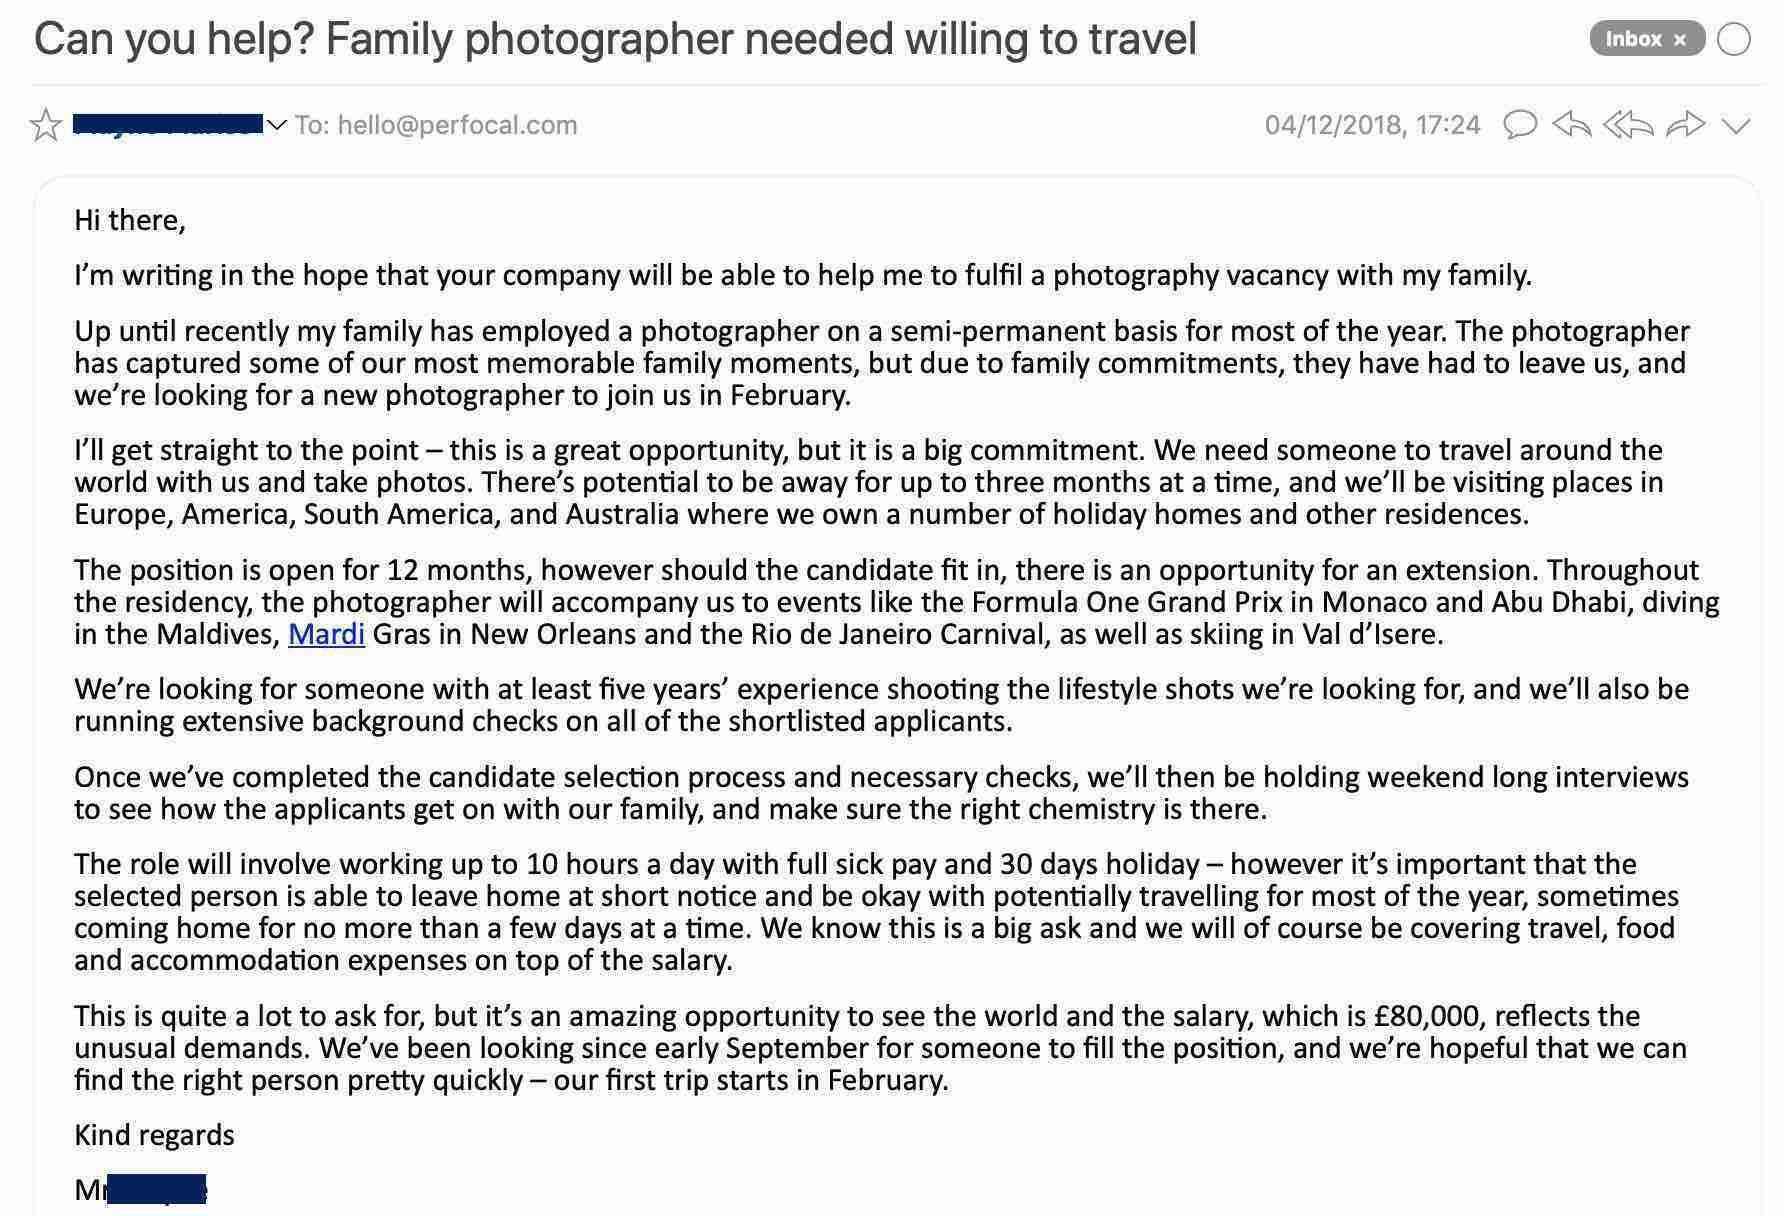 email (screenshot)